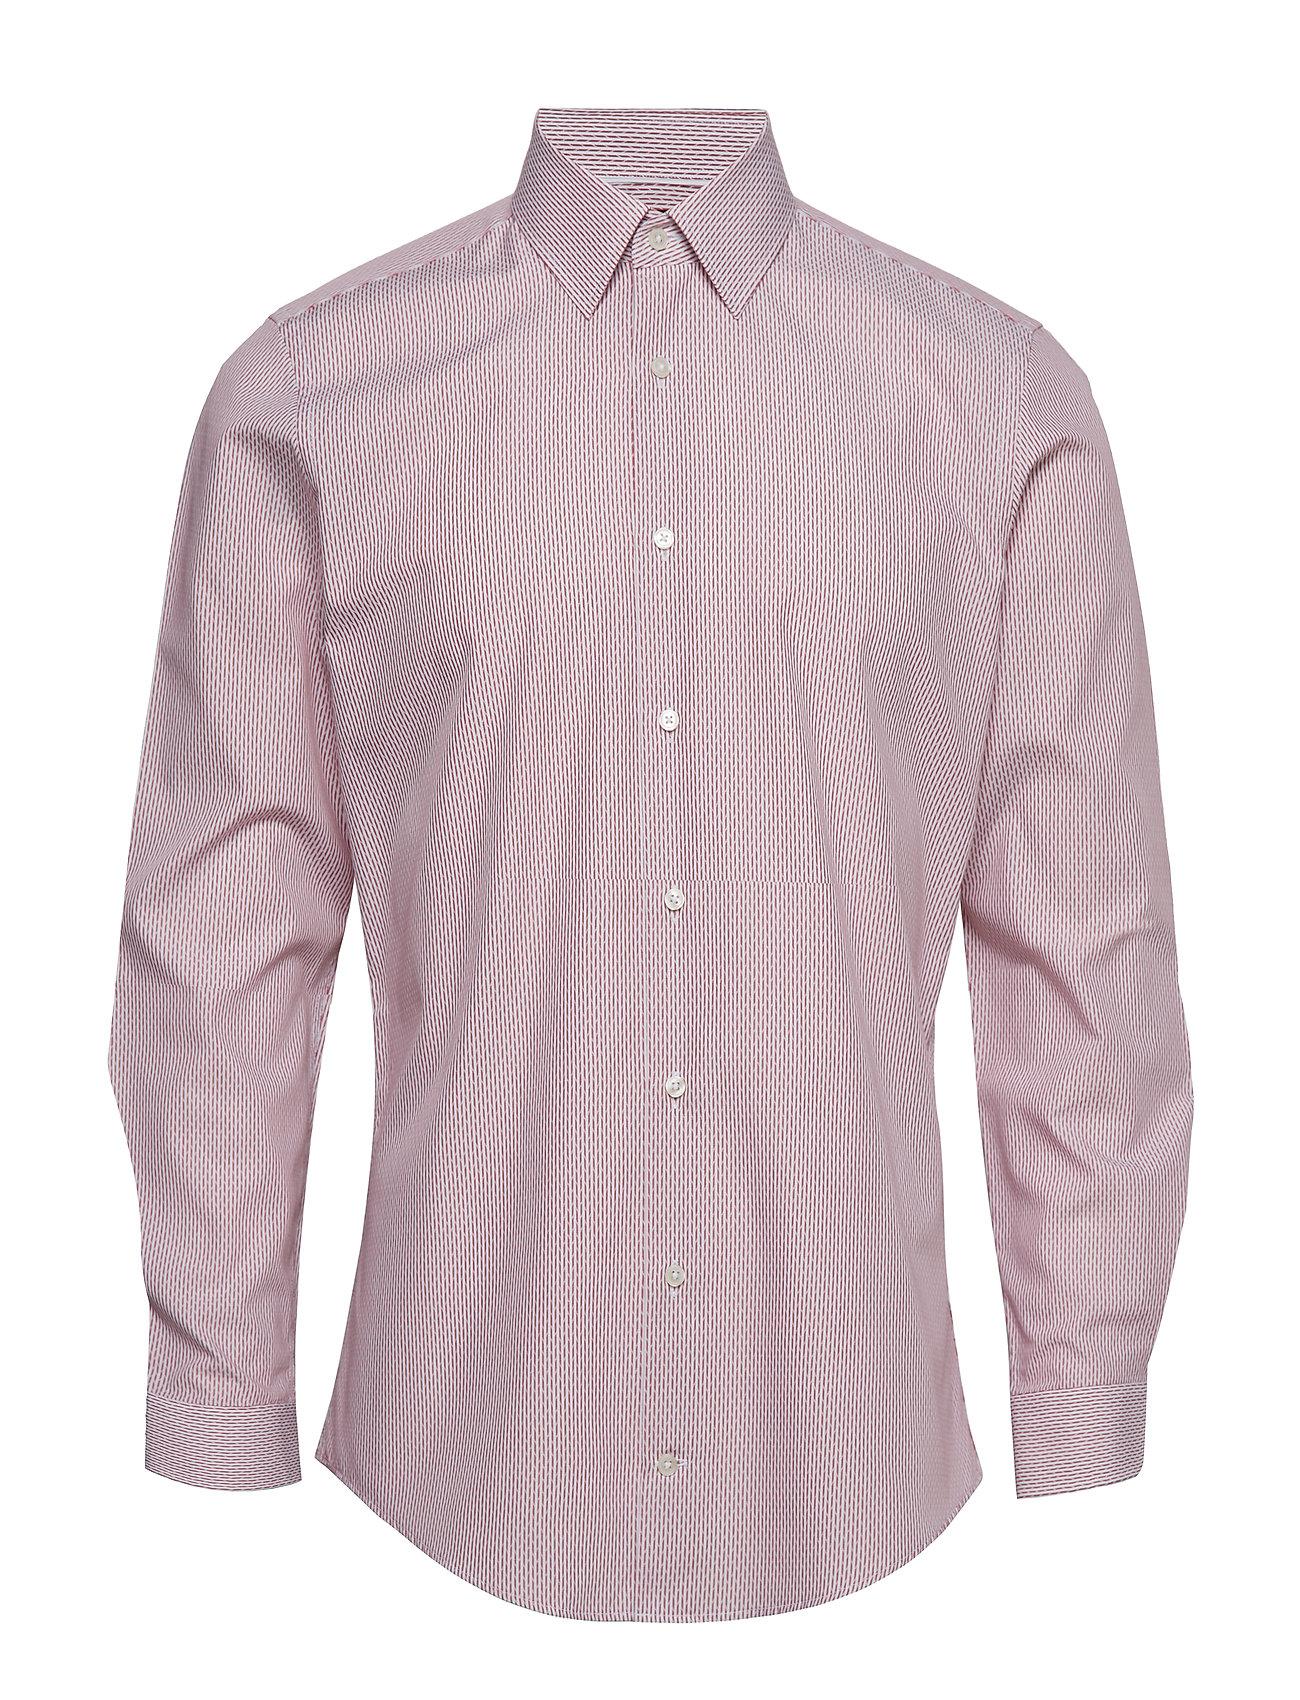 Business skjorter pink